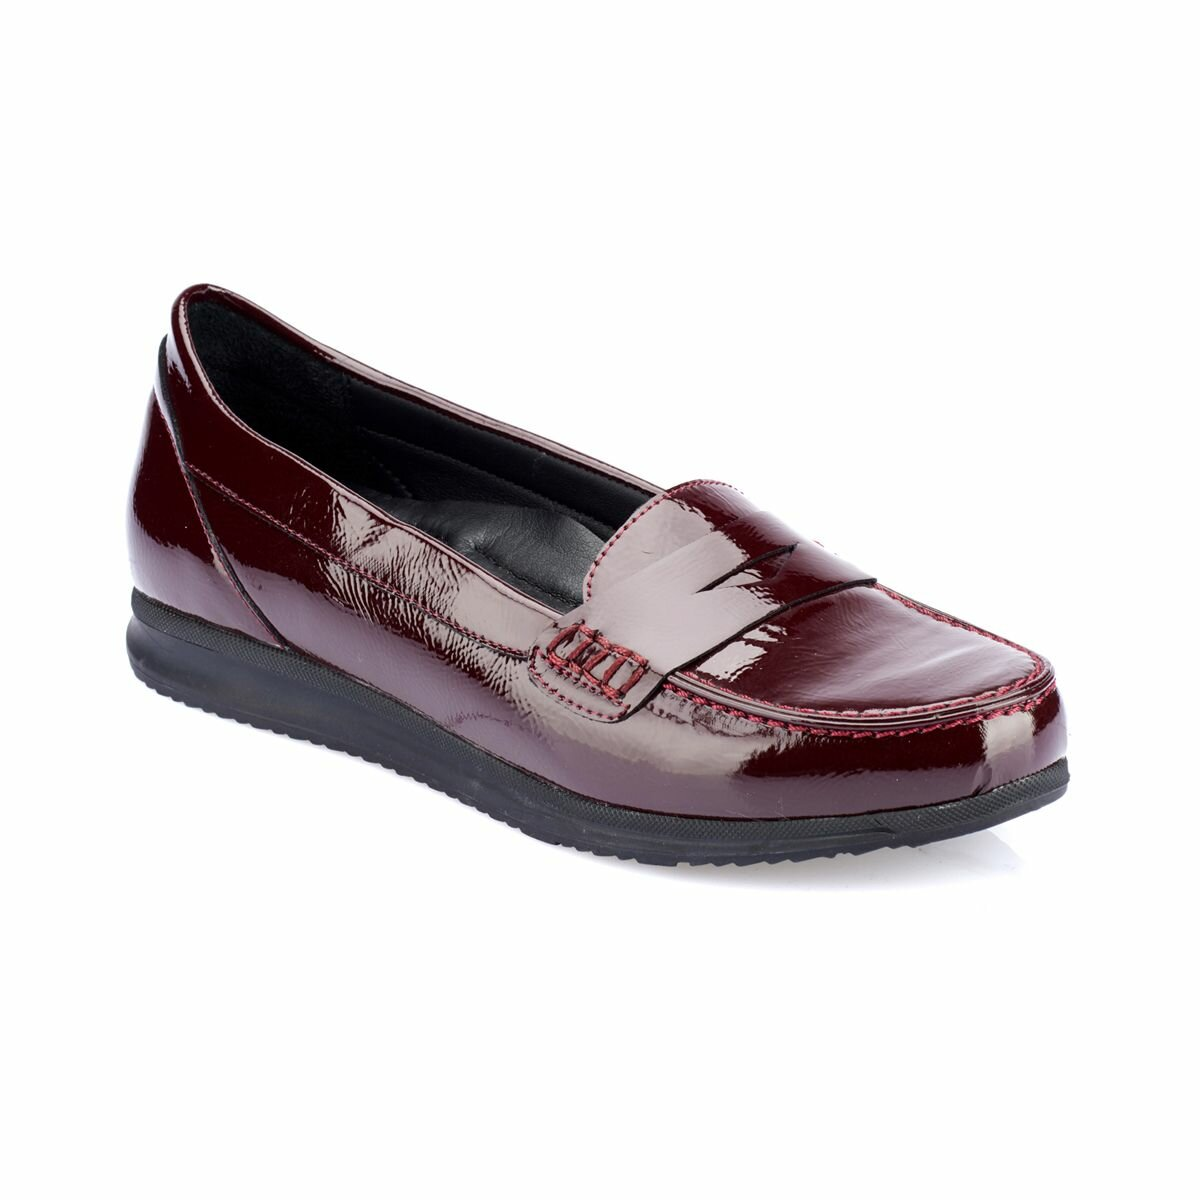 FLO TRV8202R Burgundy Women 'S Shoes Polaris